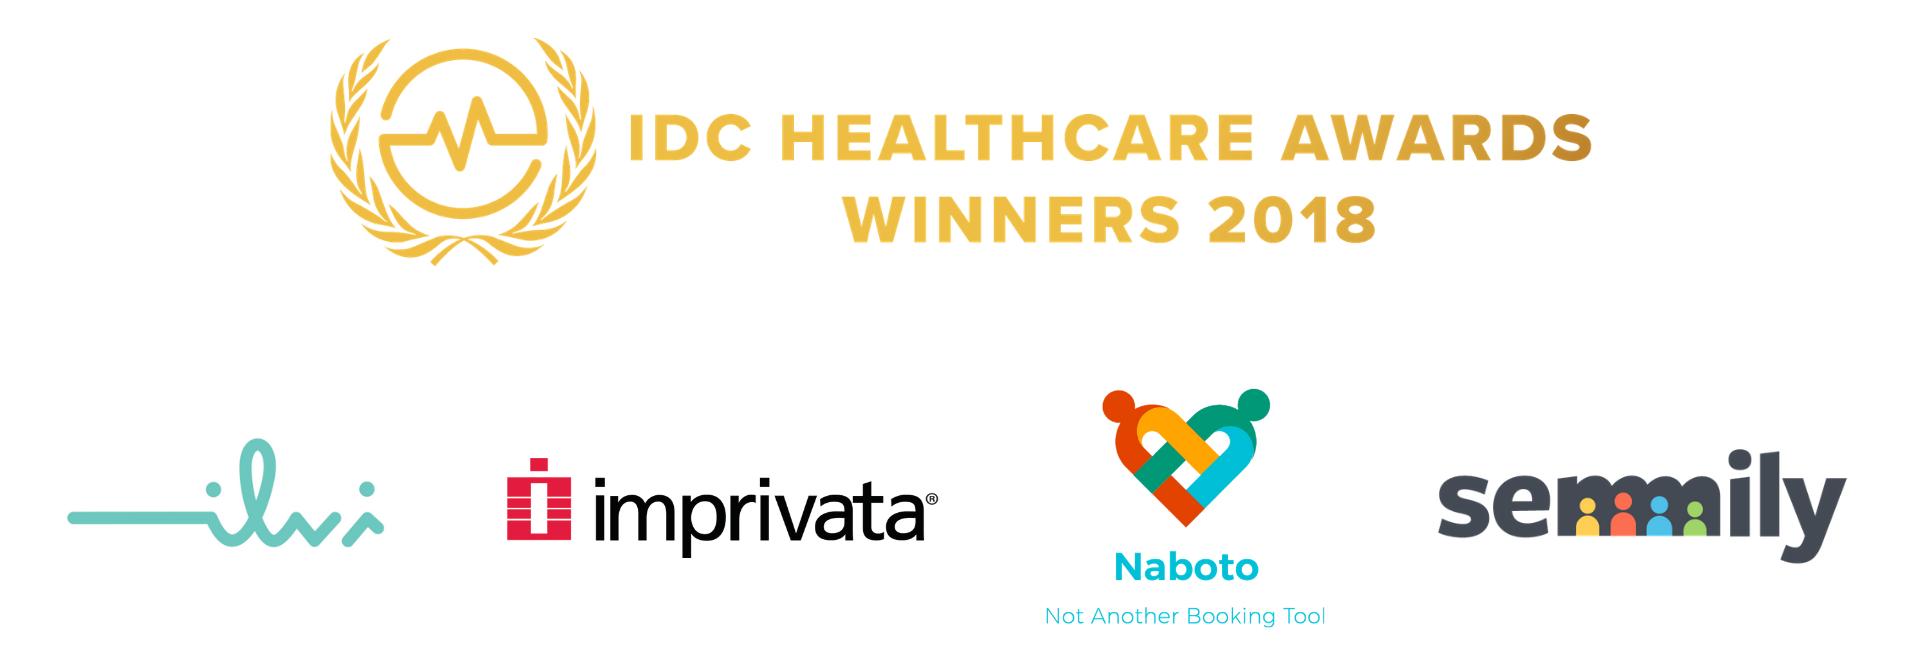 IDC Healthcare Awards 2018